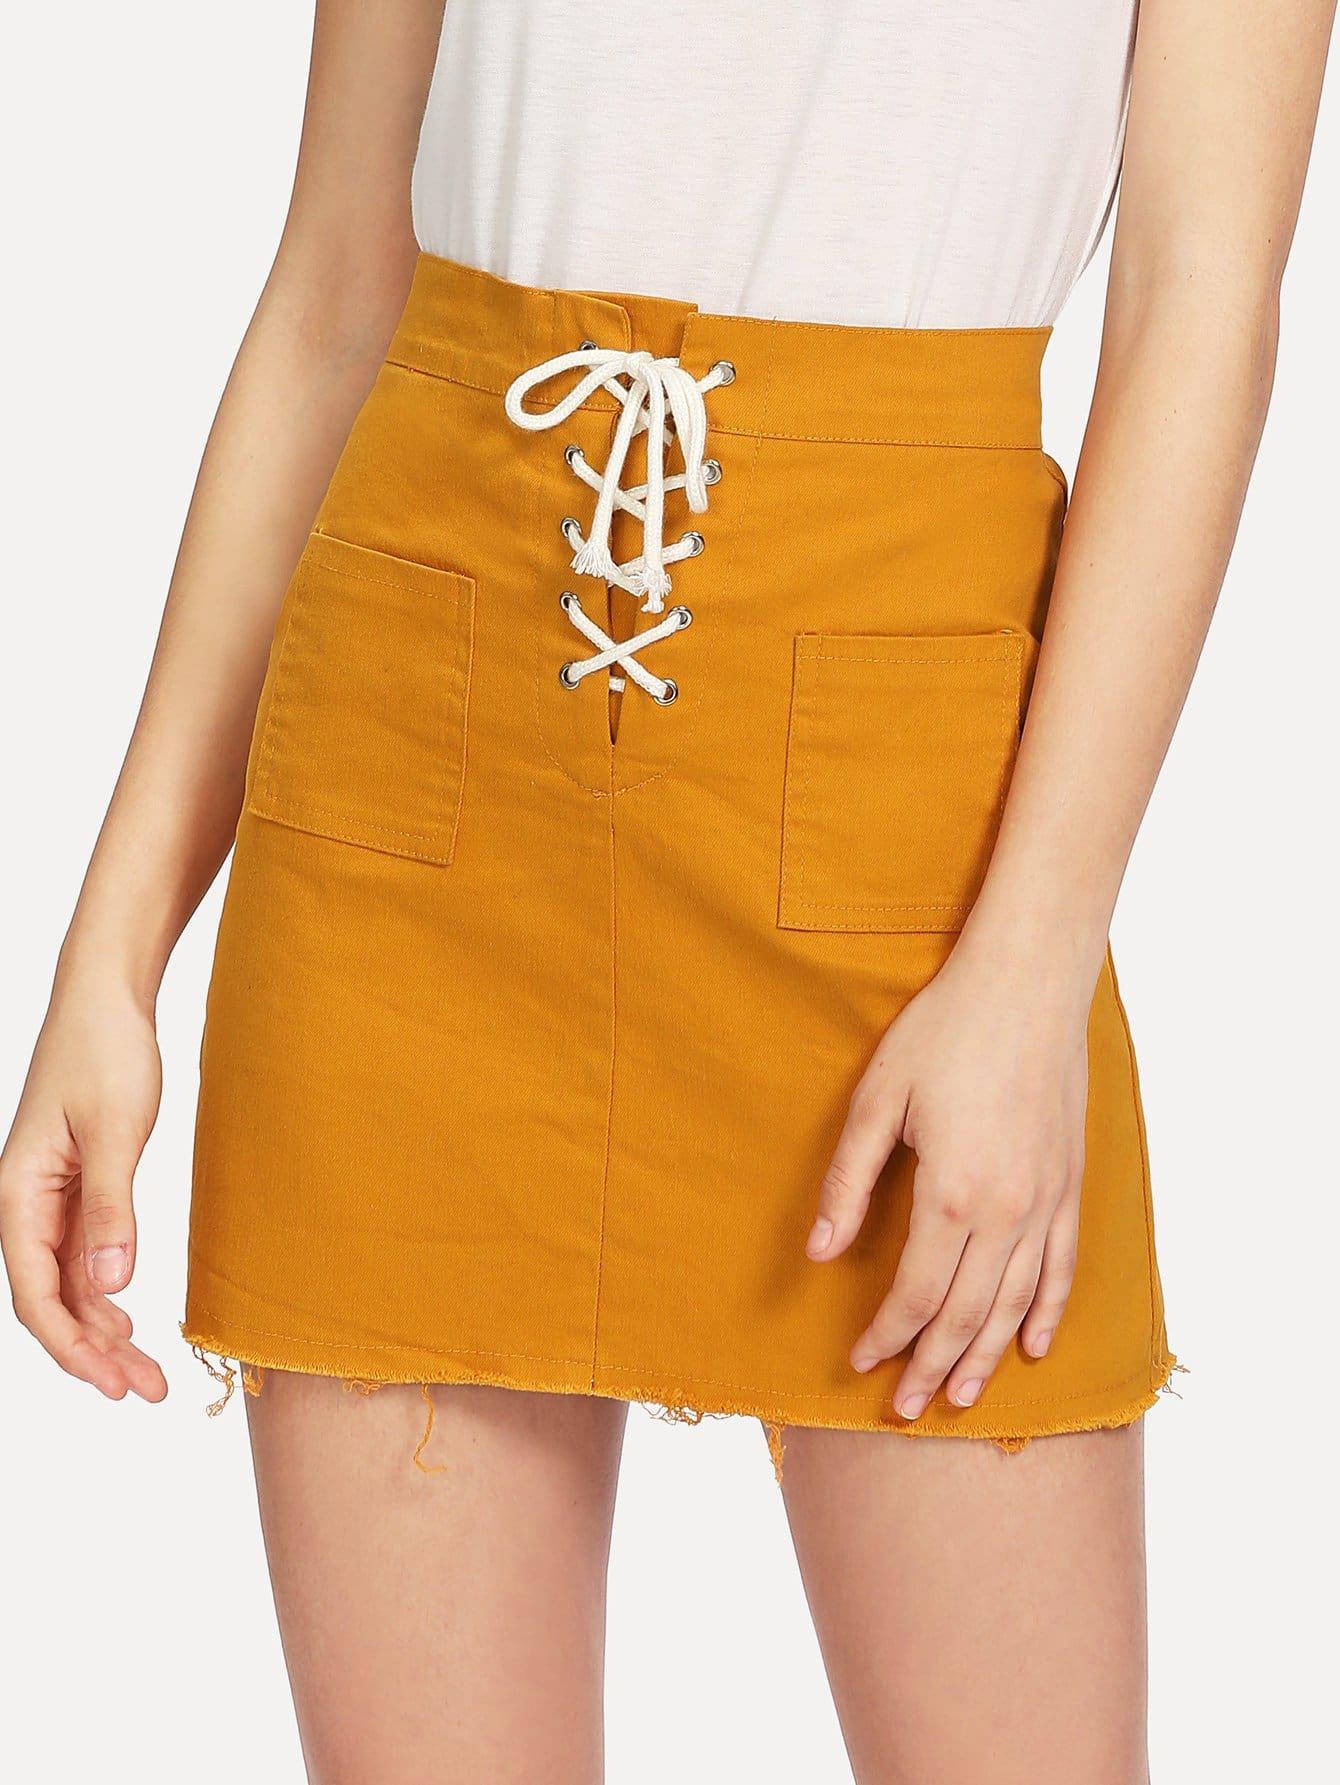 Lace Up Raw Hem Denim Skirt orange lace up design irregular hem skirt